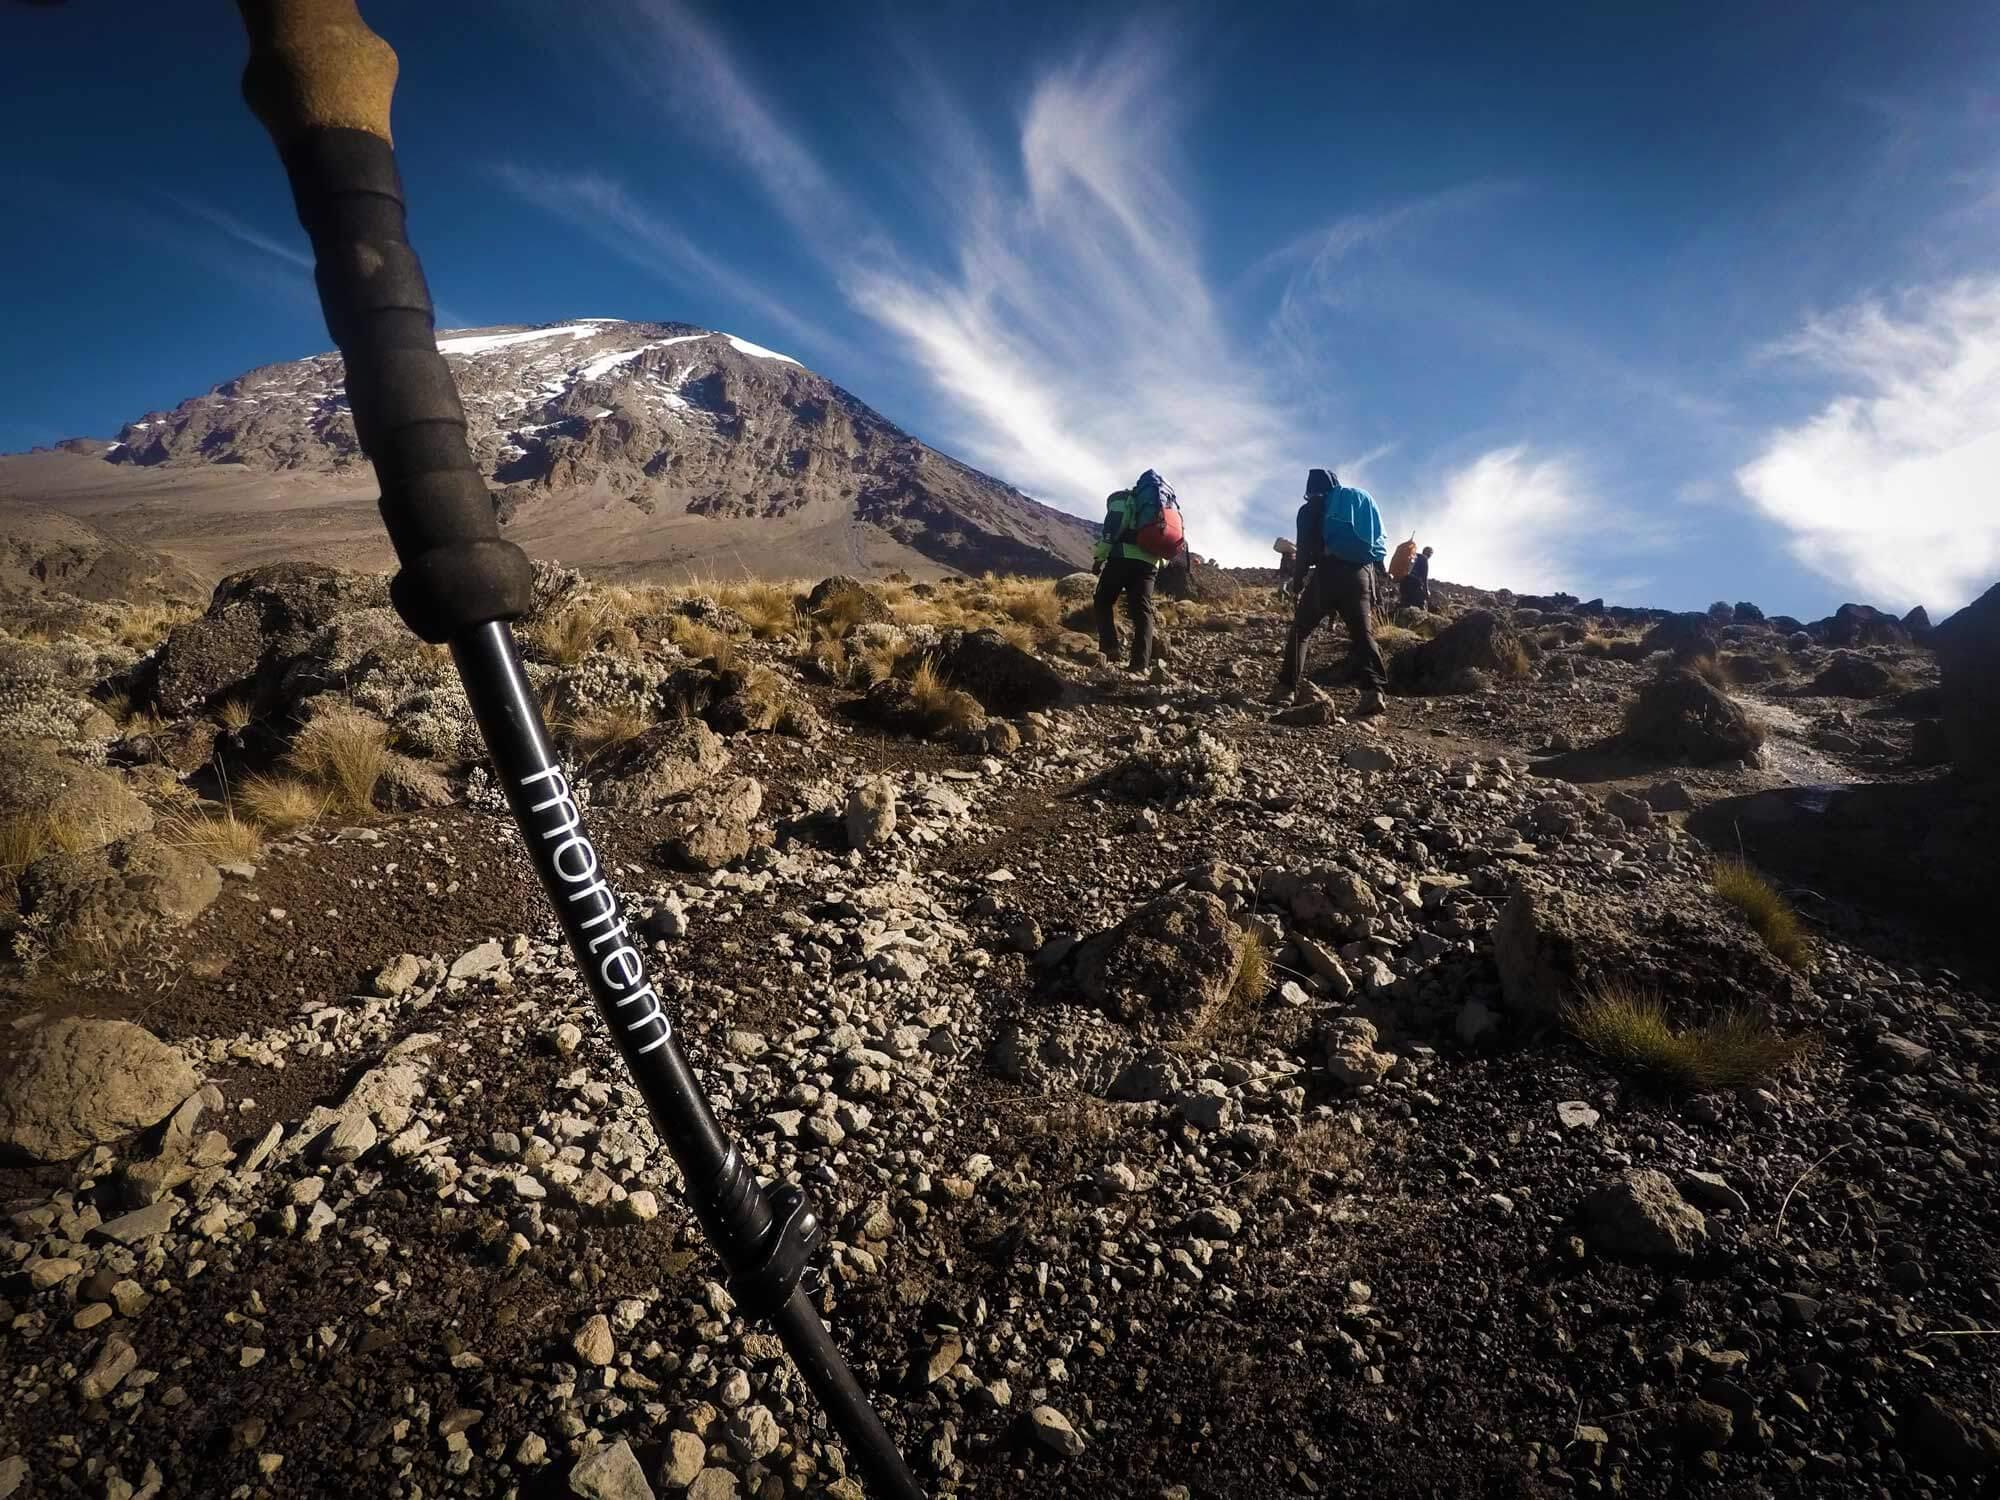 Montem Trekking Poles On A Hike